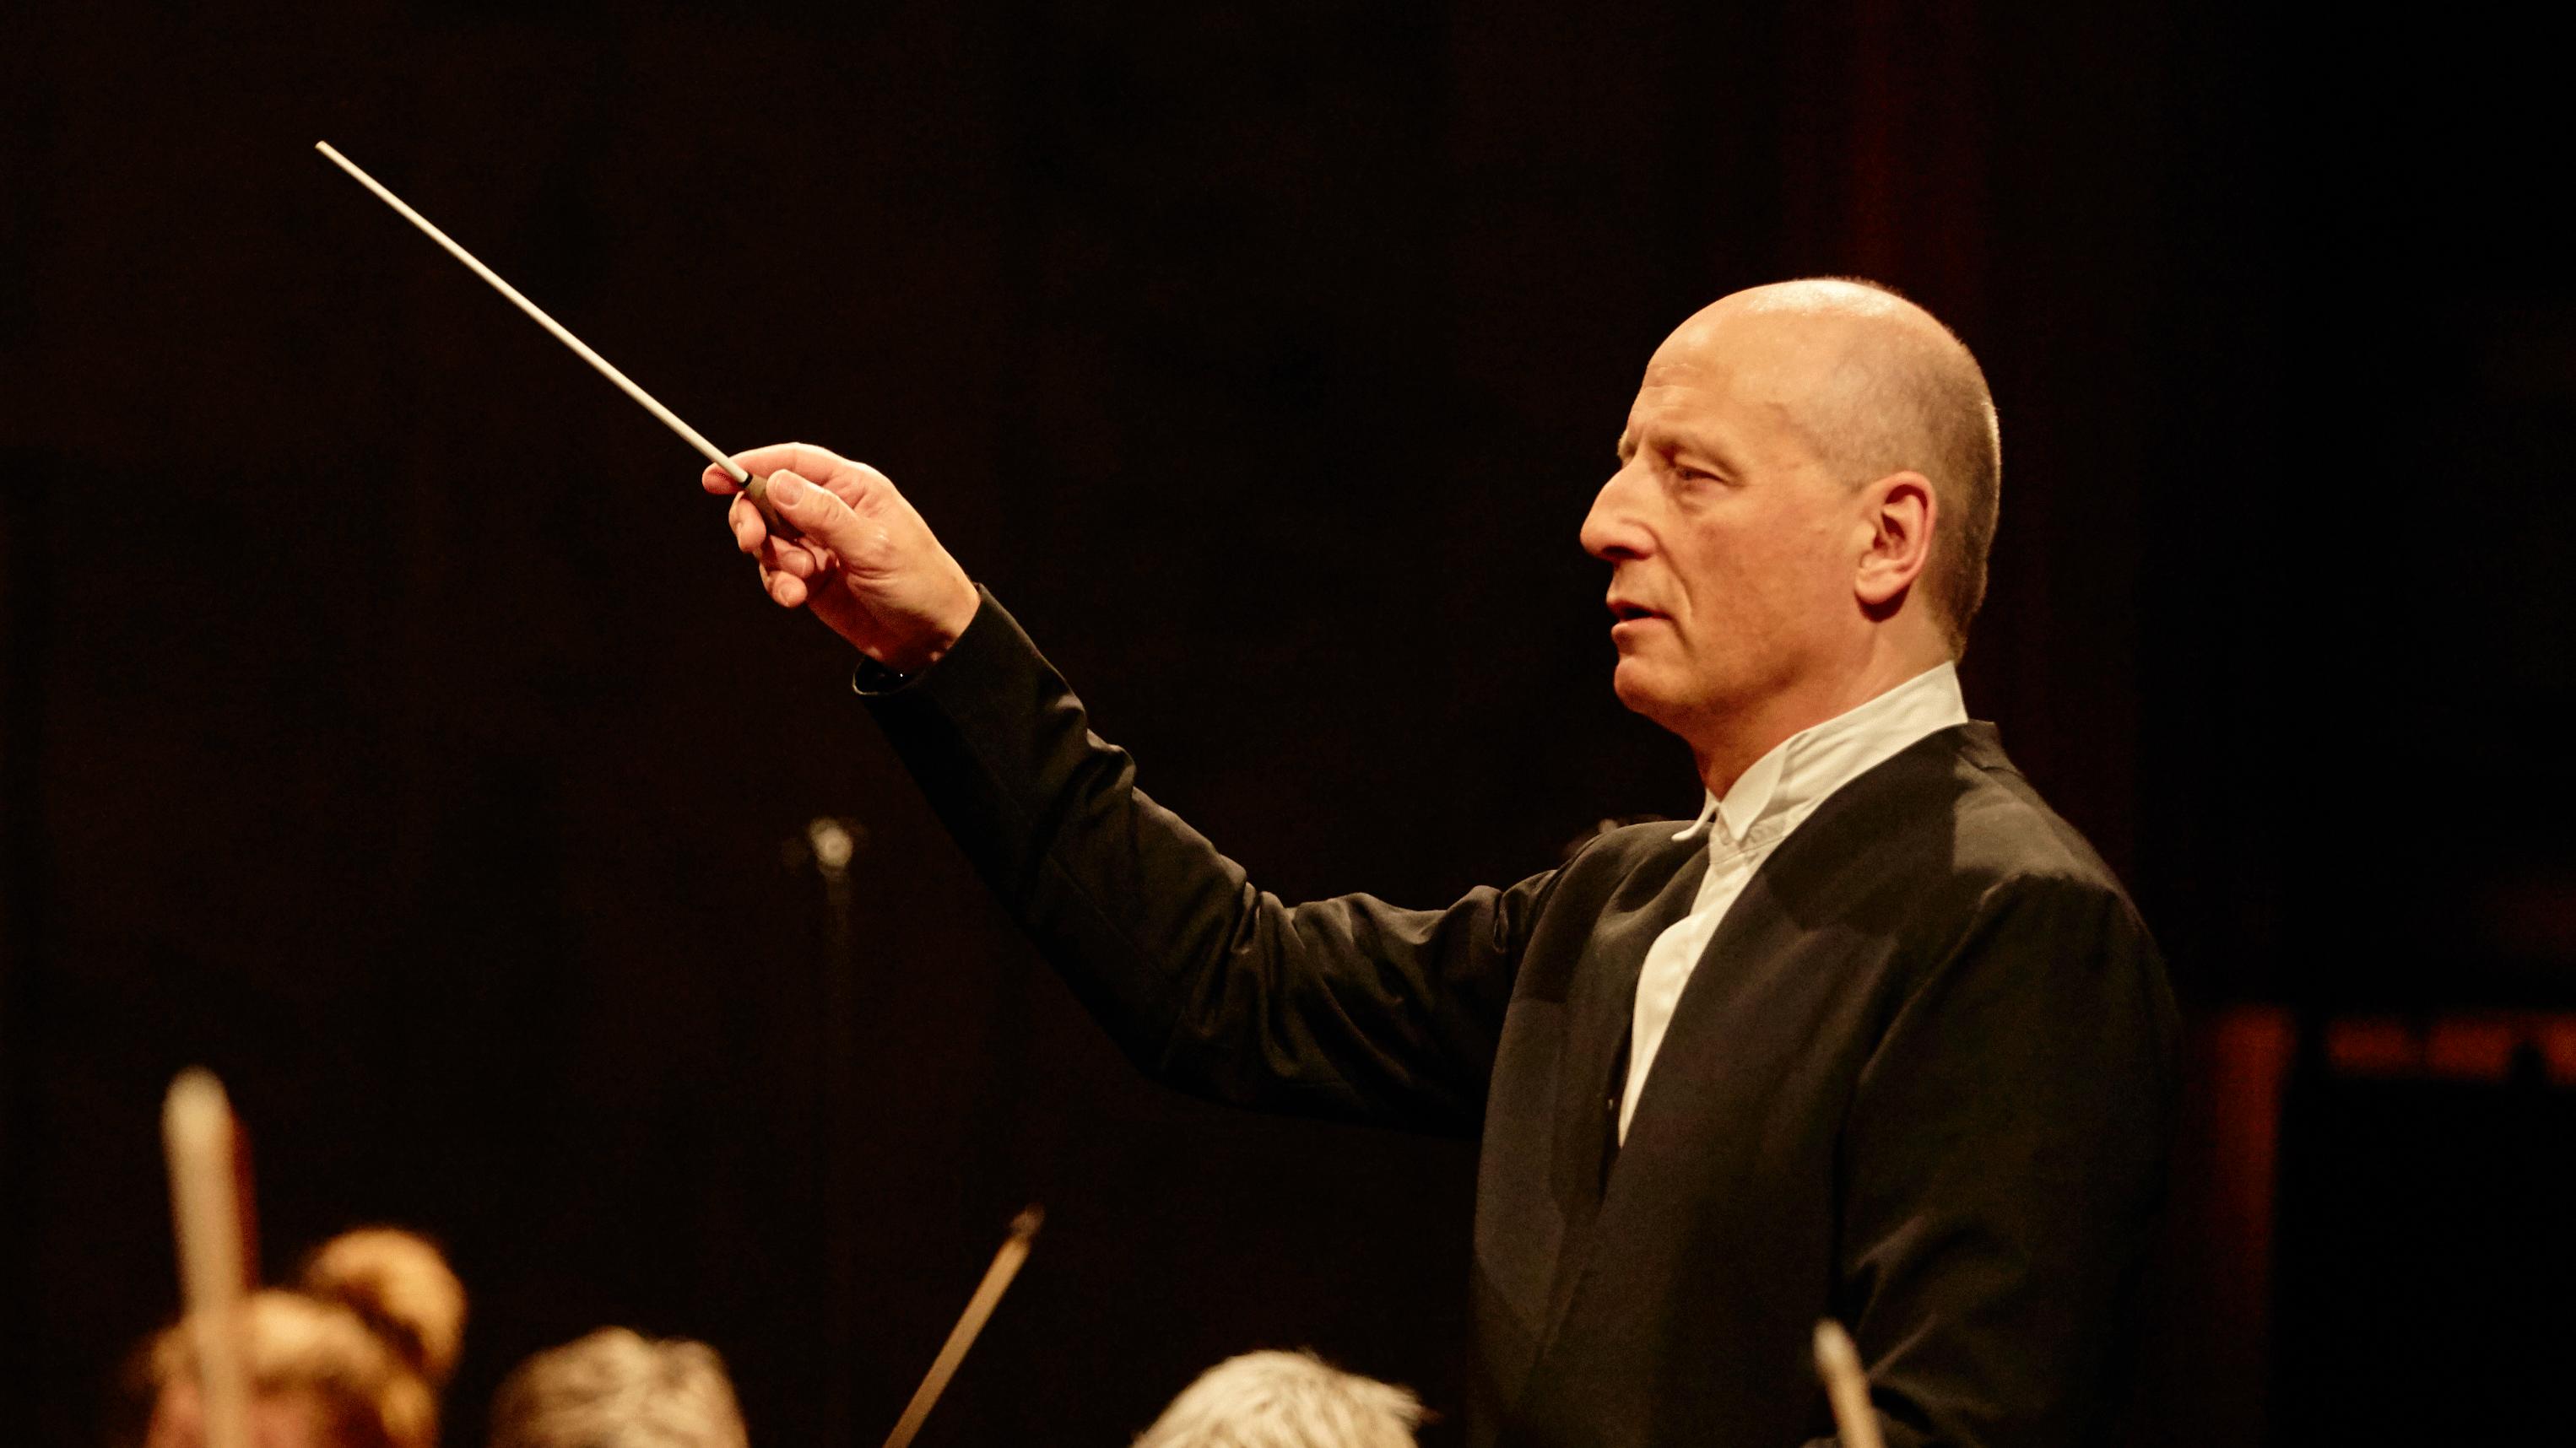 Paavo Järvi conducts Brahms's Symphony No. 4